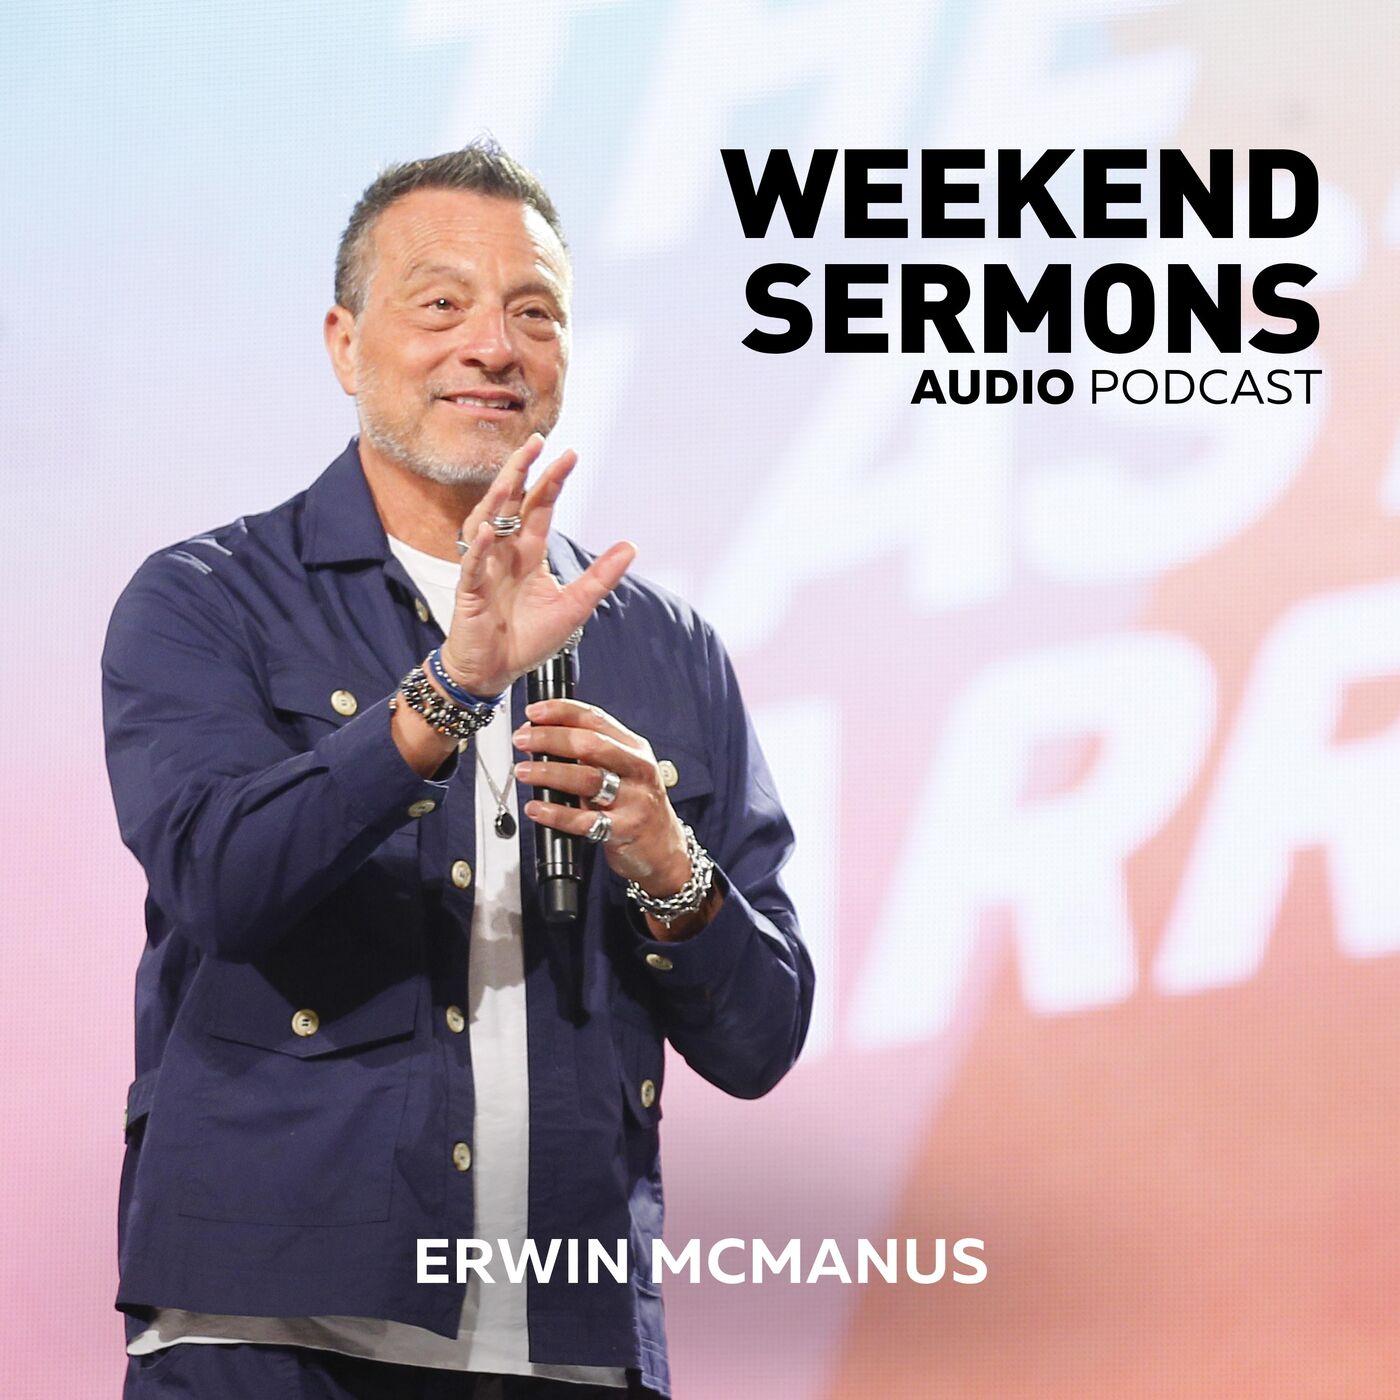 Erwin McManus: The Way of the Warrior